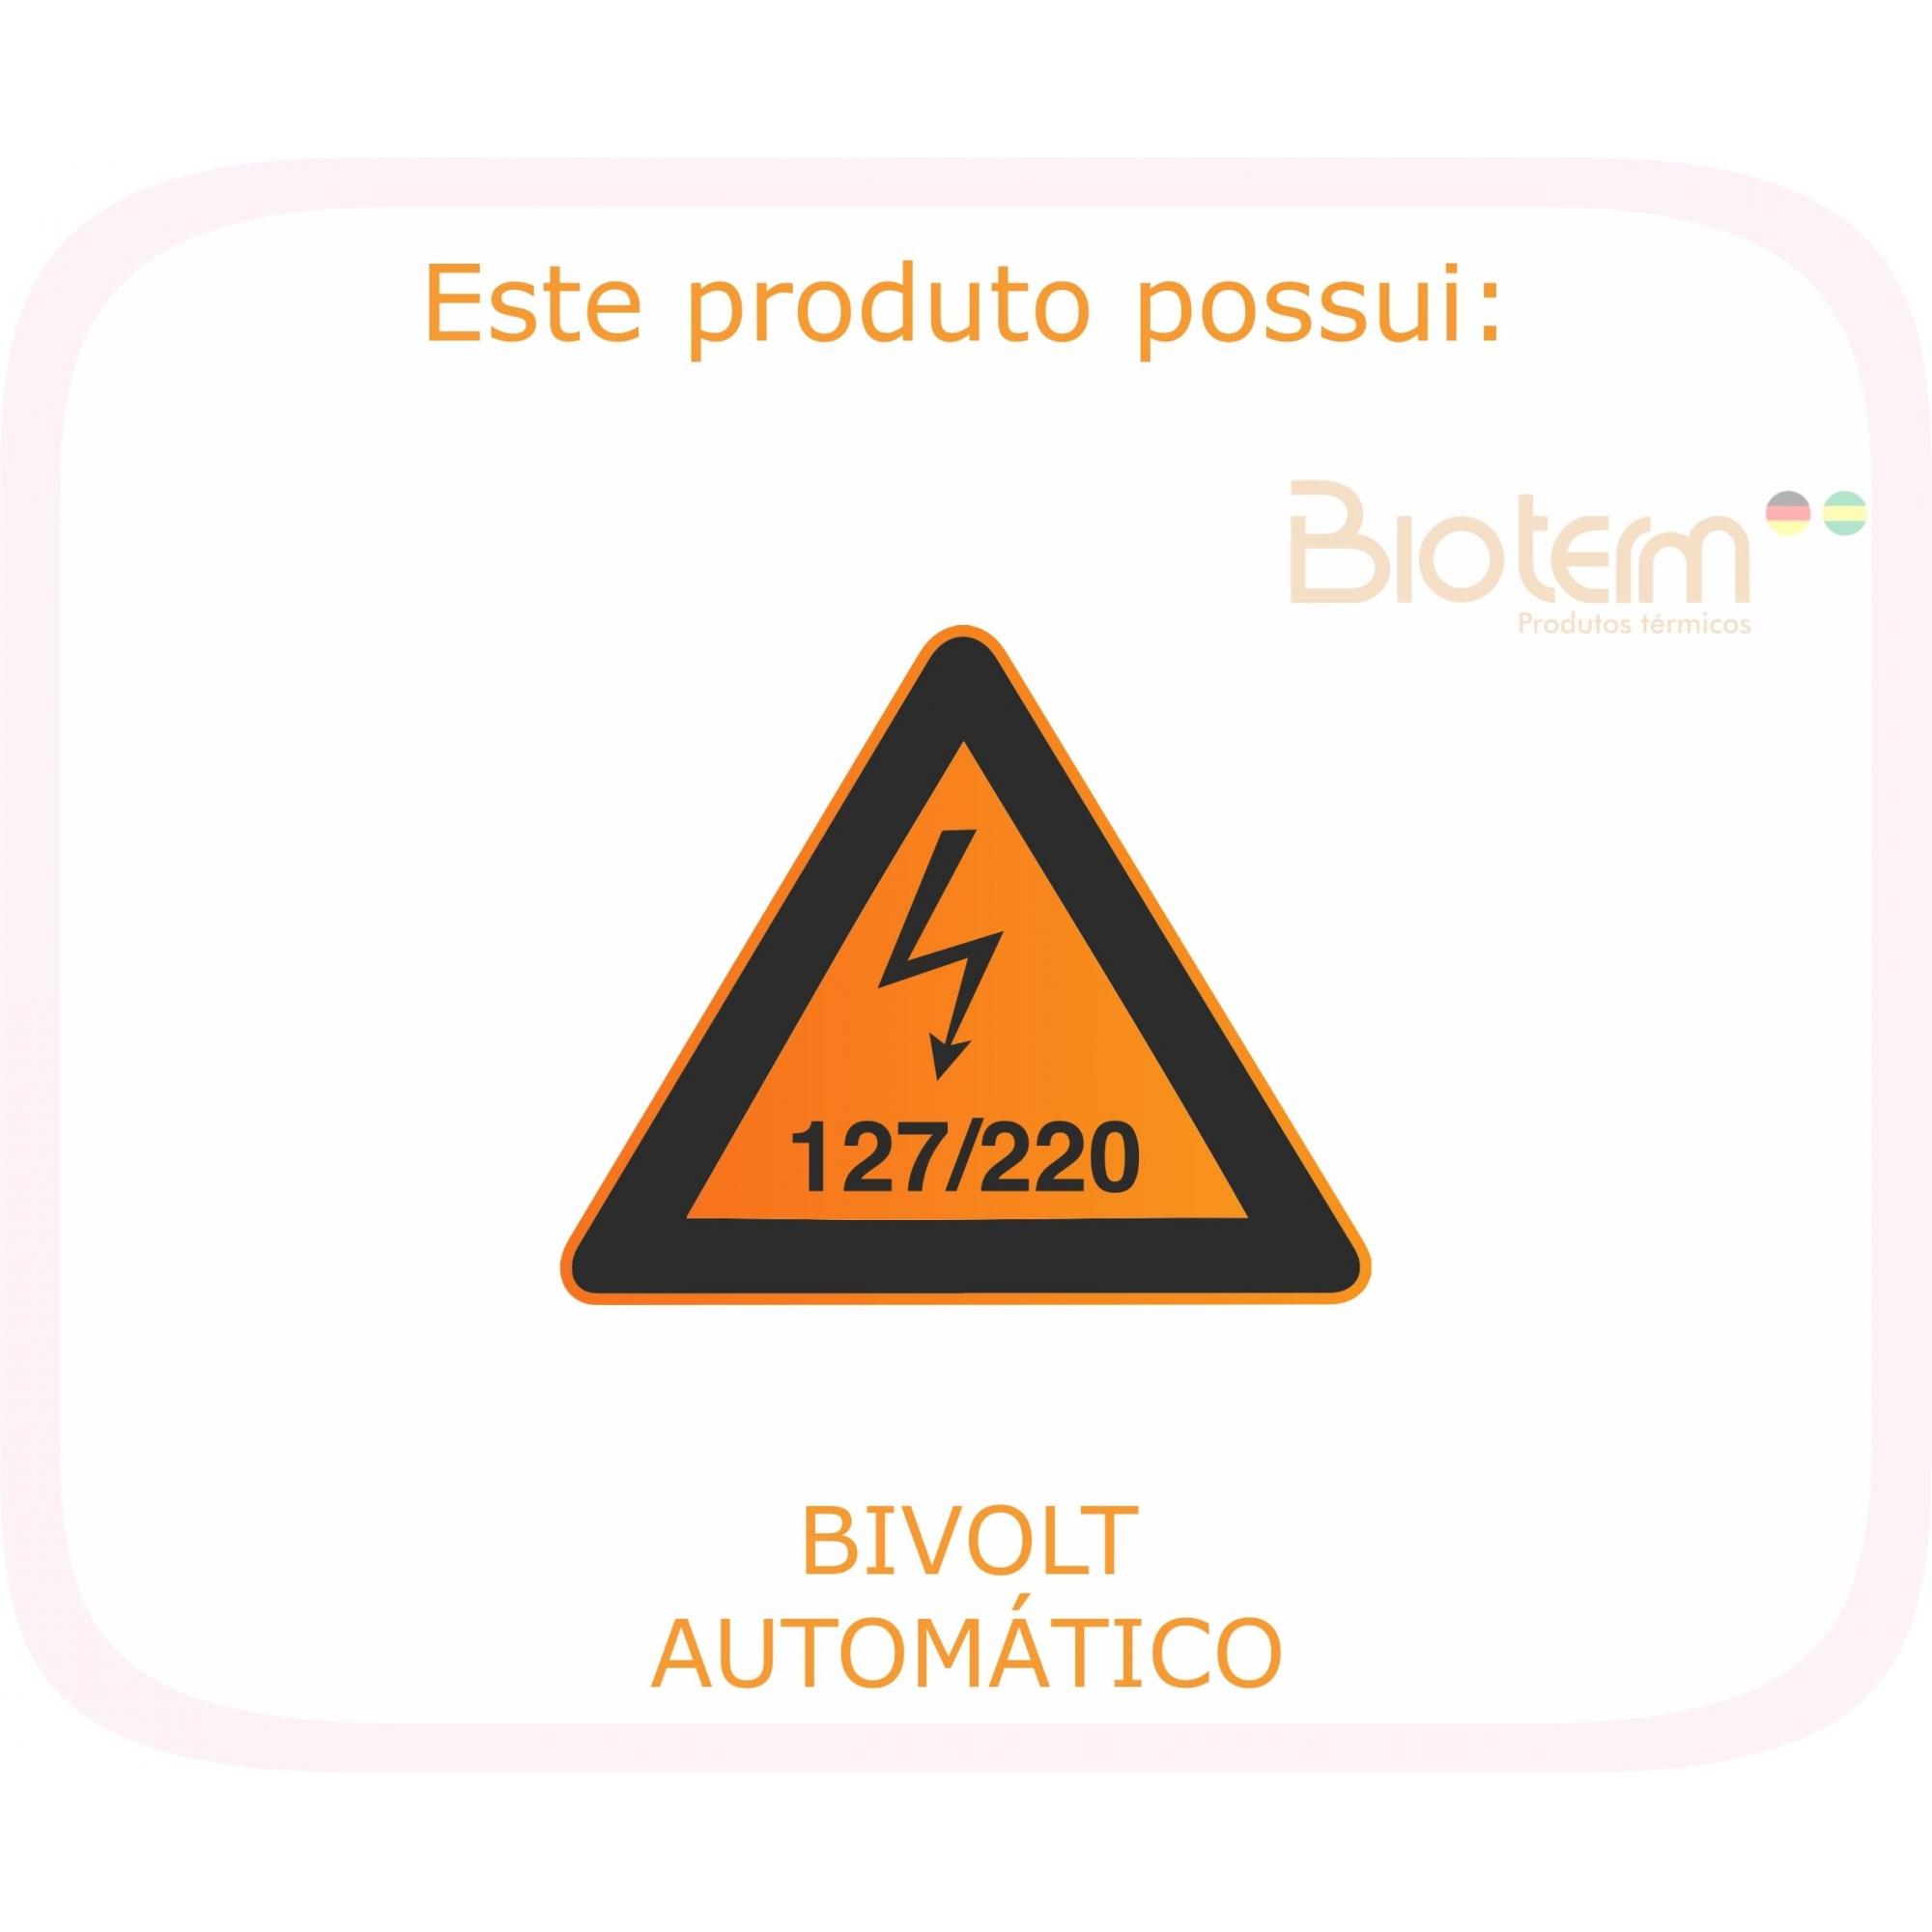 Manta Termoelétrica Meio Corpo Digital Bivolt Automático Bio Term